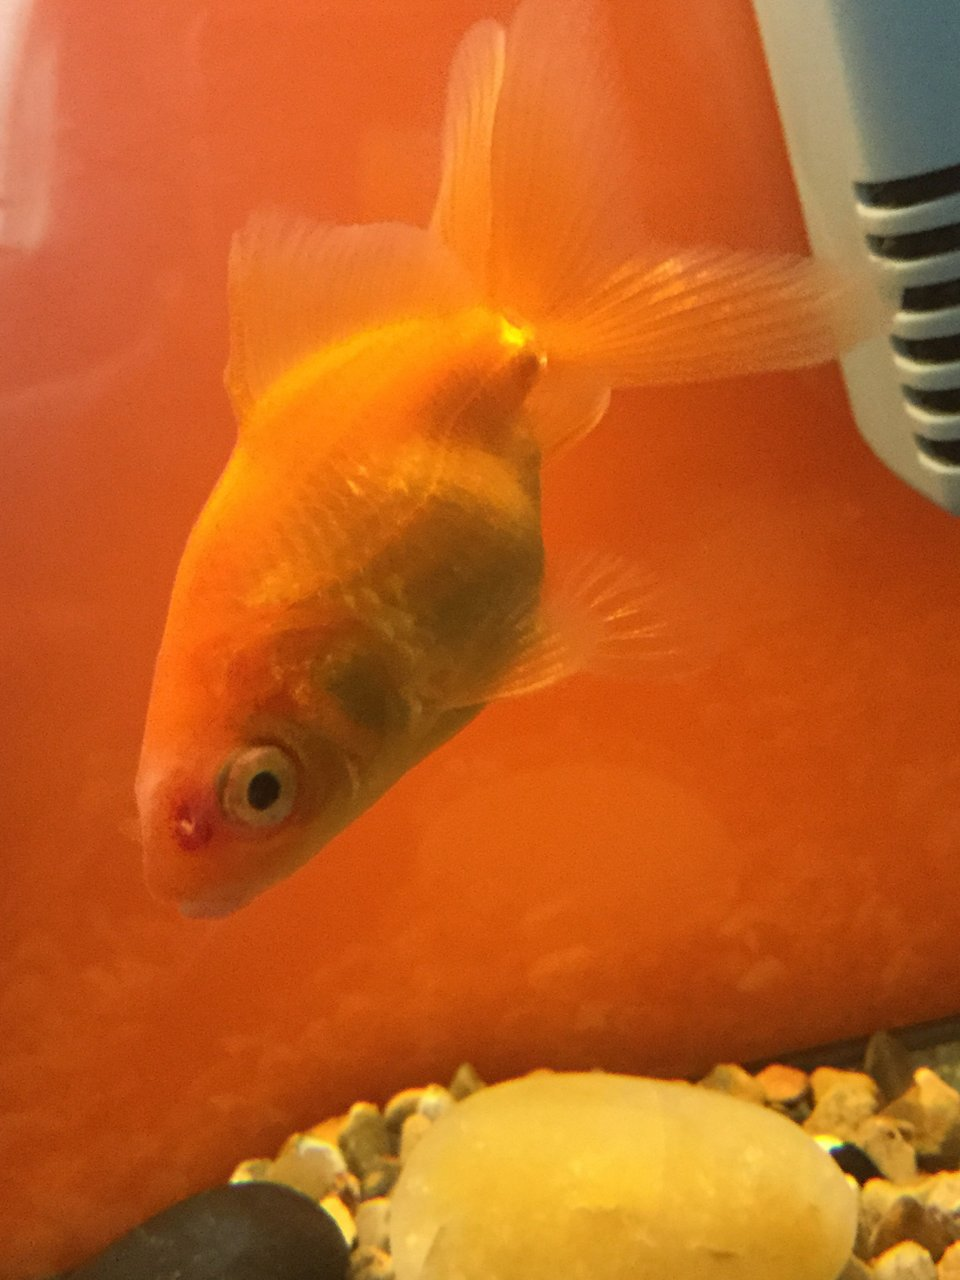 Fish aquarium red spots - My Fish Has Hit A Red Spot On Him Will It Go Away